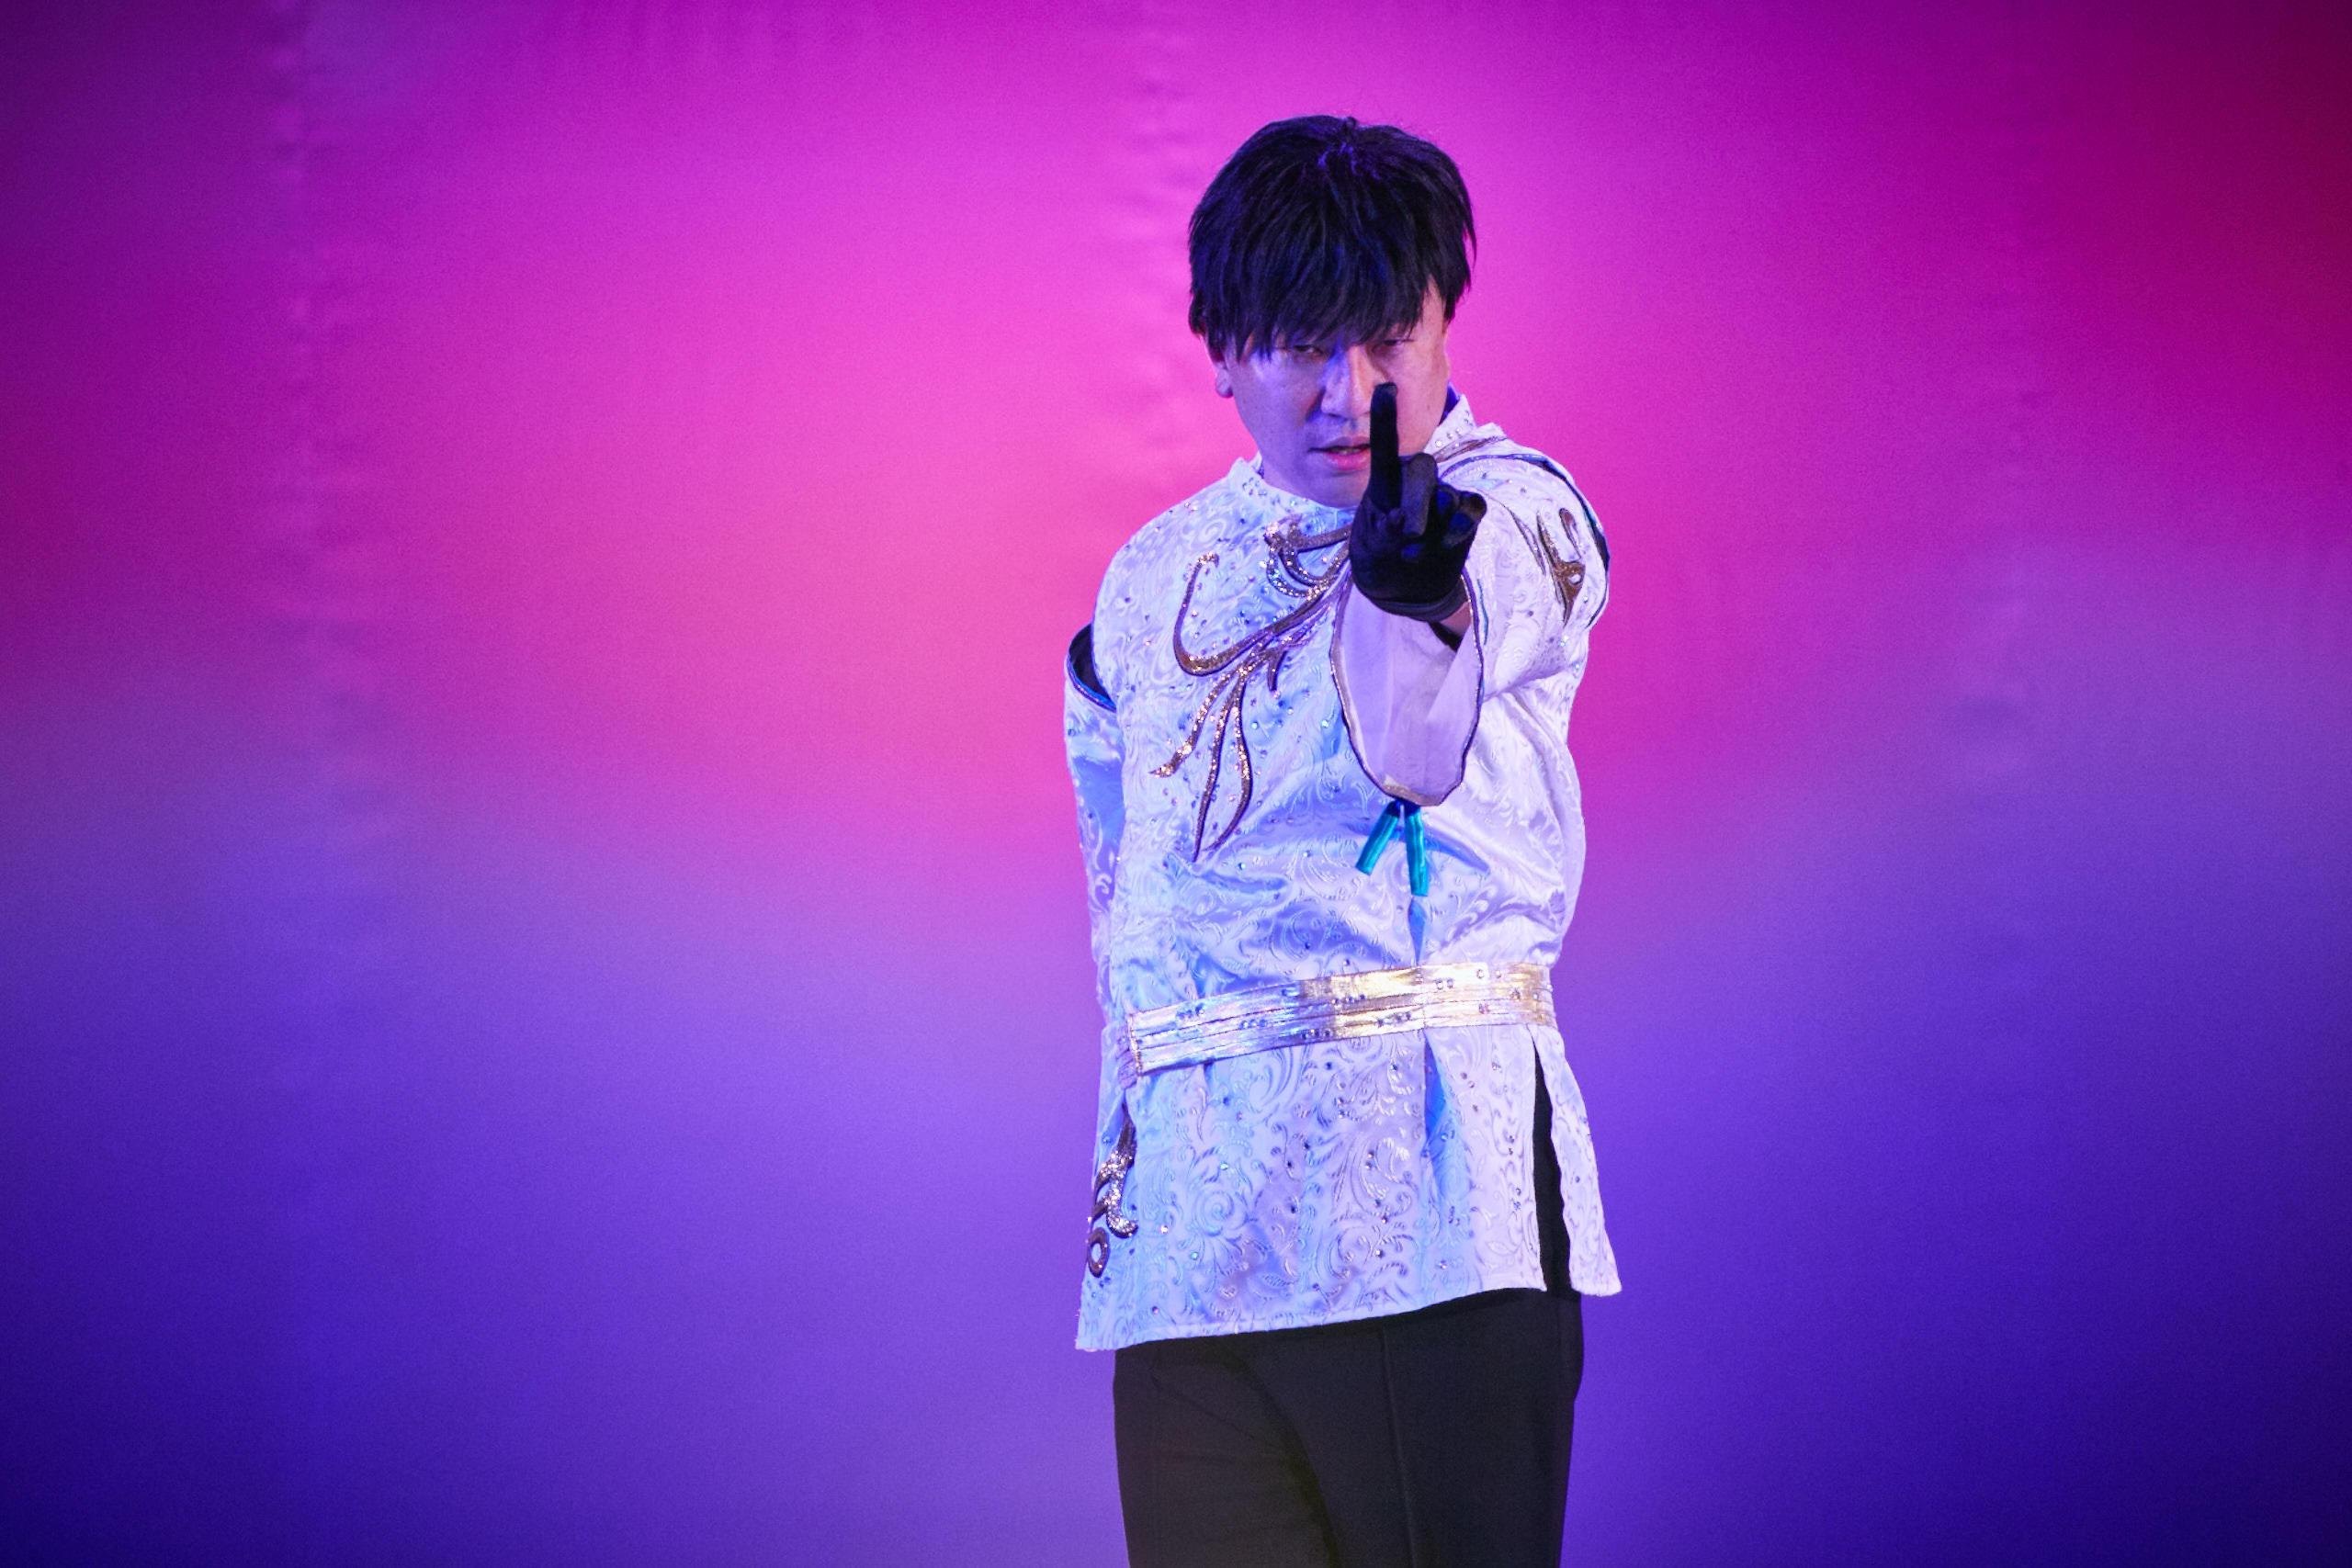 http://news.yoshimoto.co.jp/20180716103828-764d3d4ccba83b128a6d625aa3d60f9234e2b128.jpg